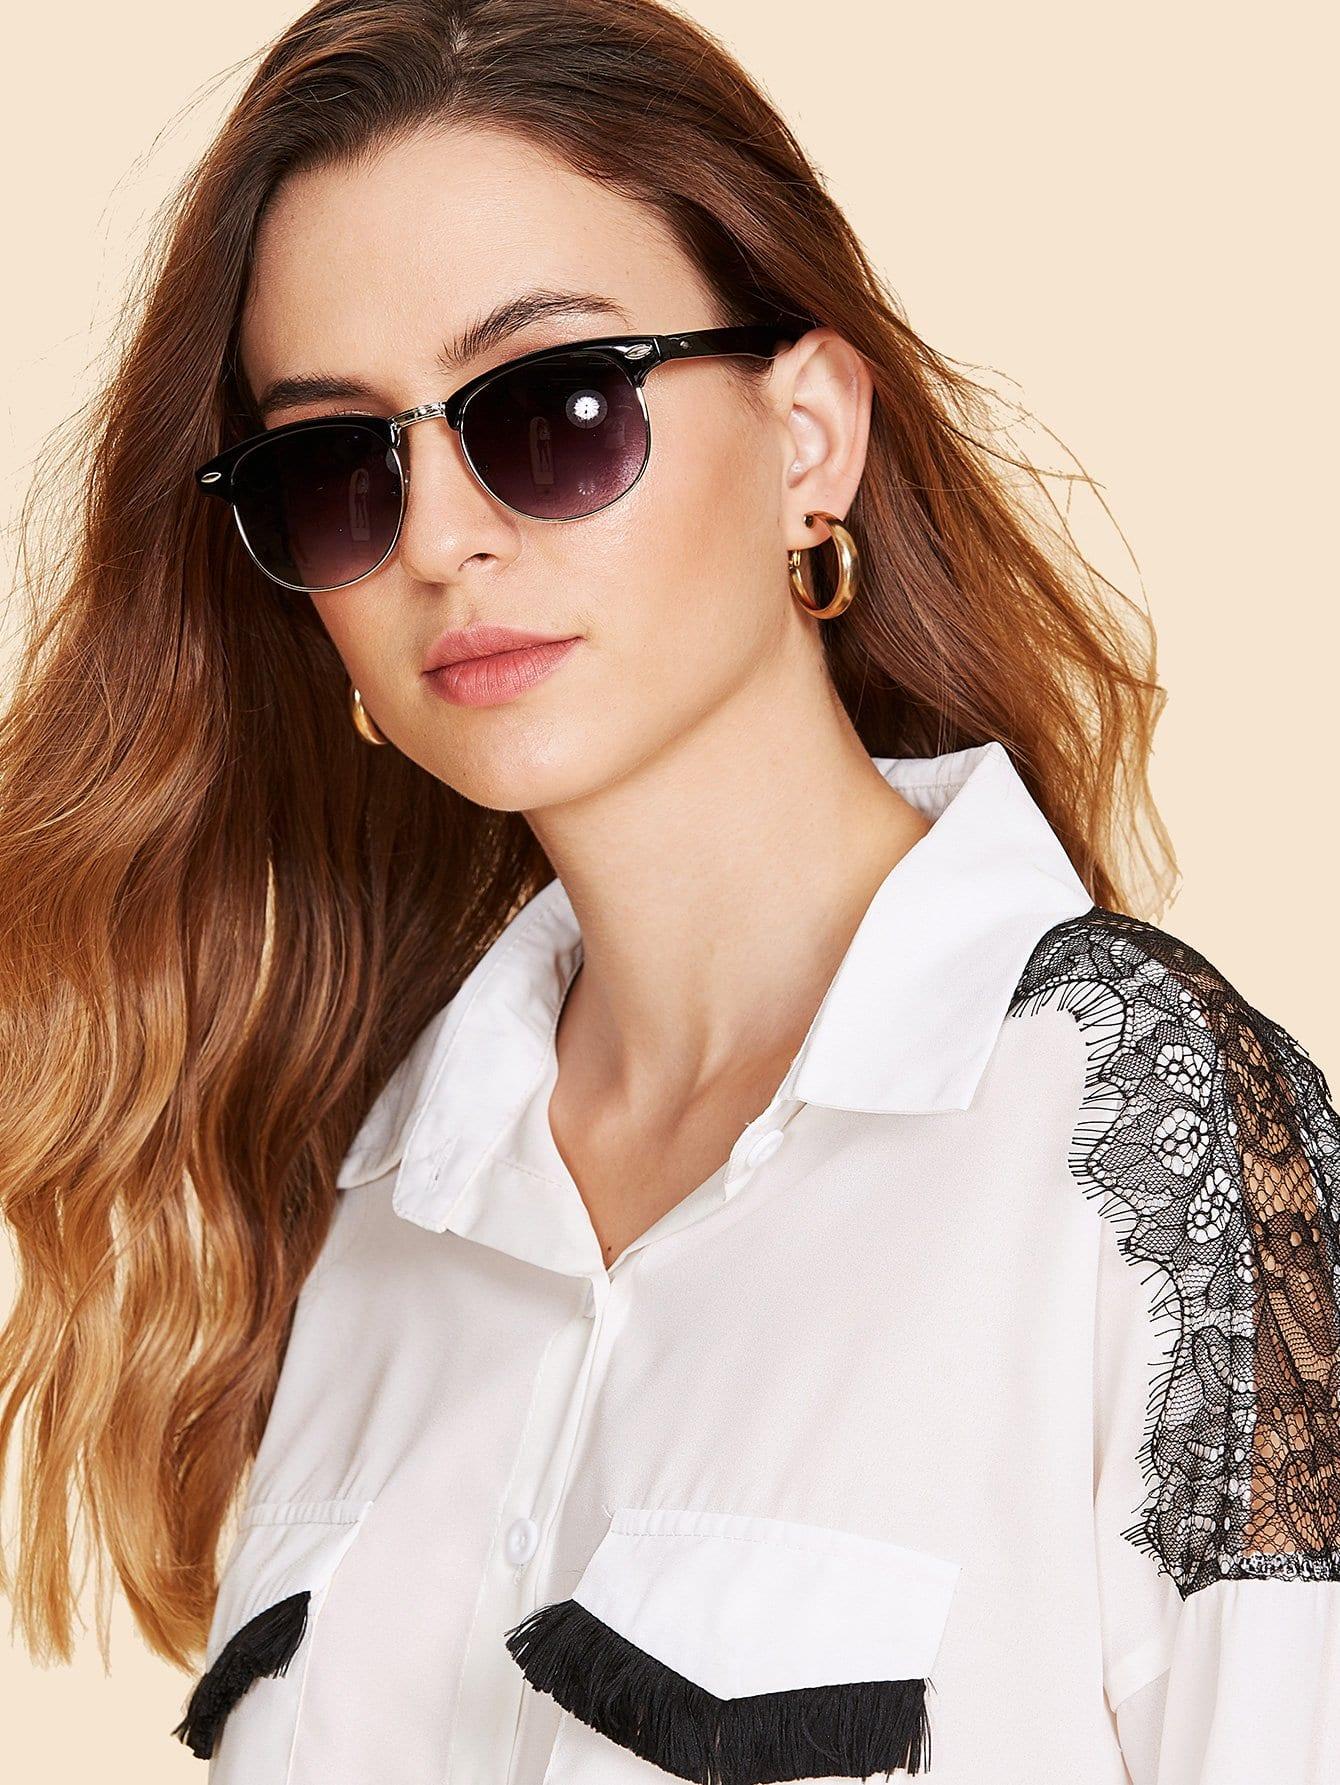 Mirror Lens Sunglasses triangle design mirror lens sunglasses